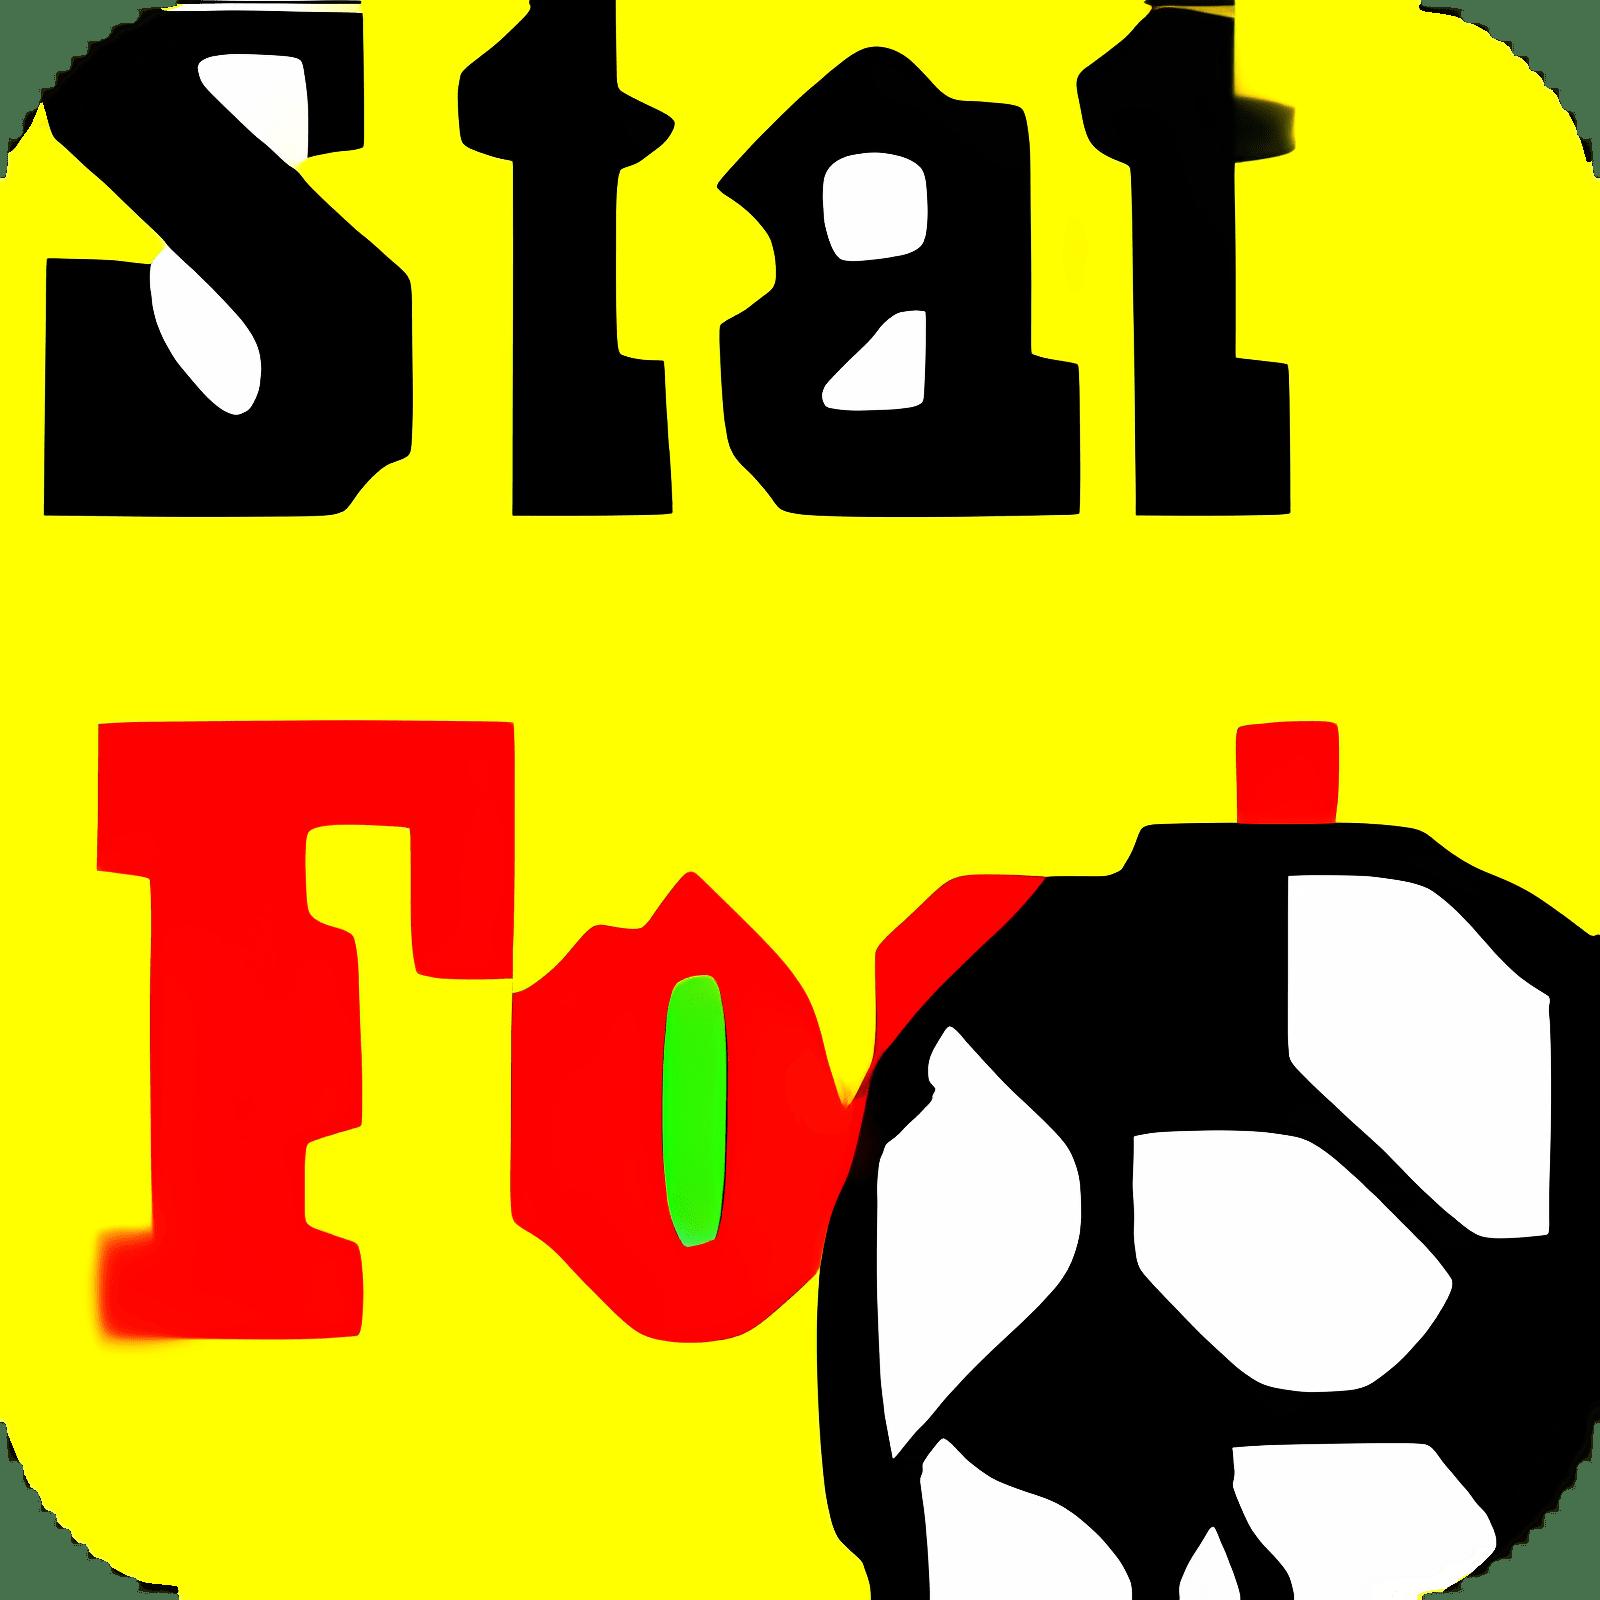 StatFoot32